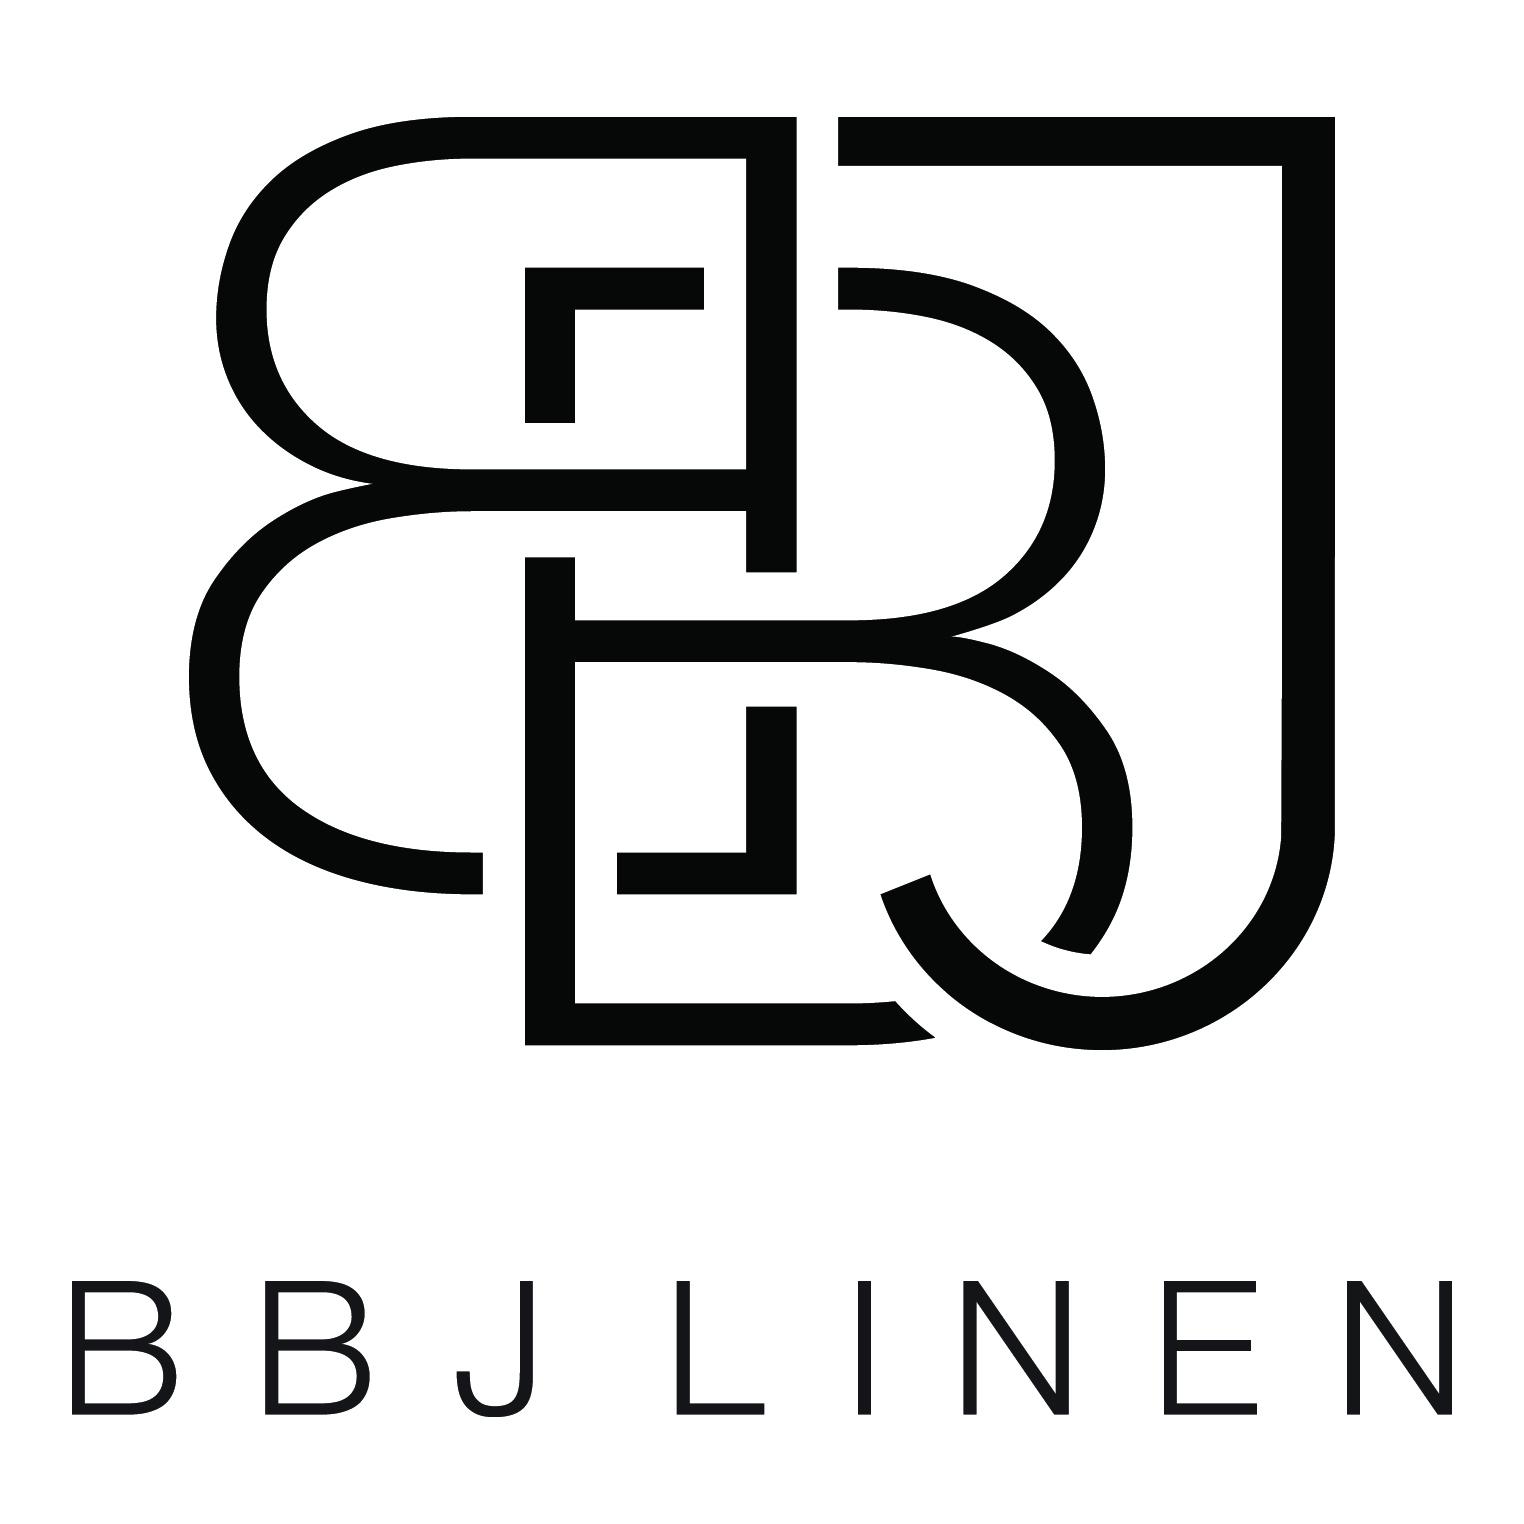 16. BBJ.jpg